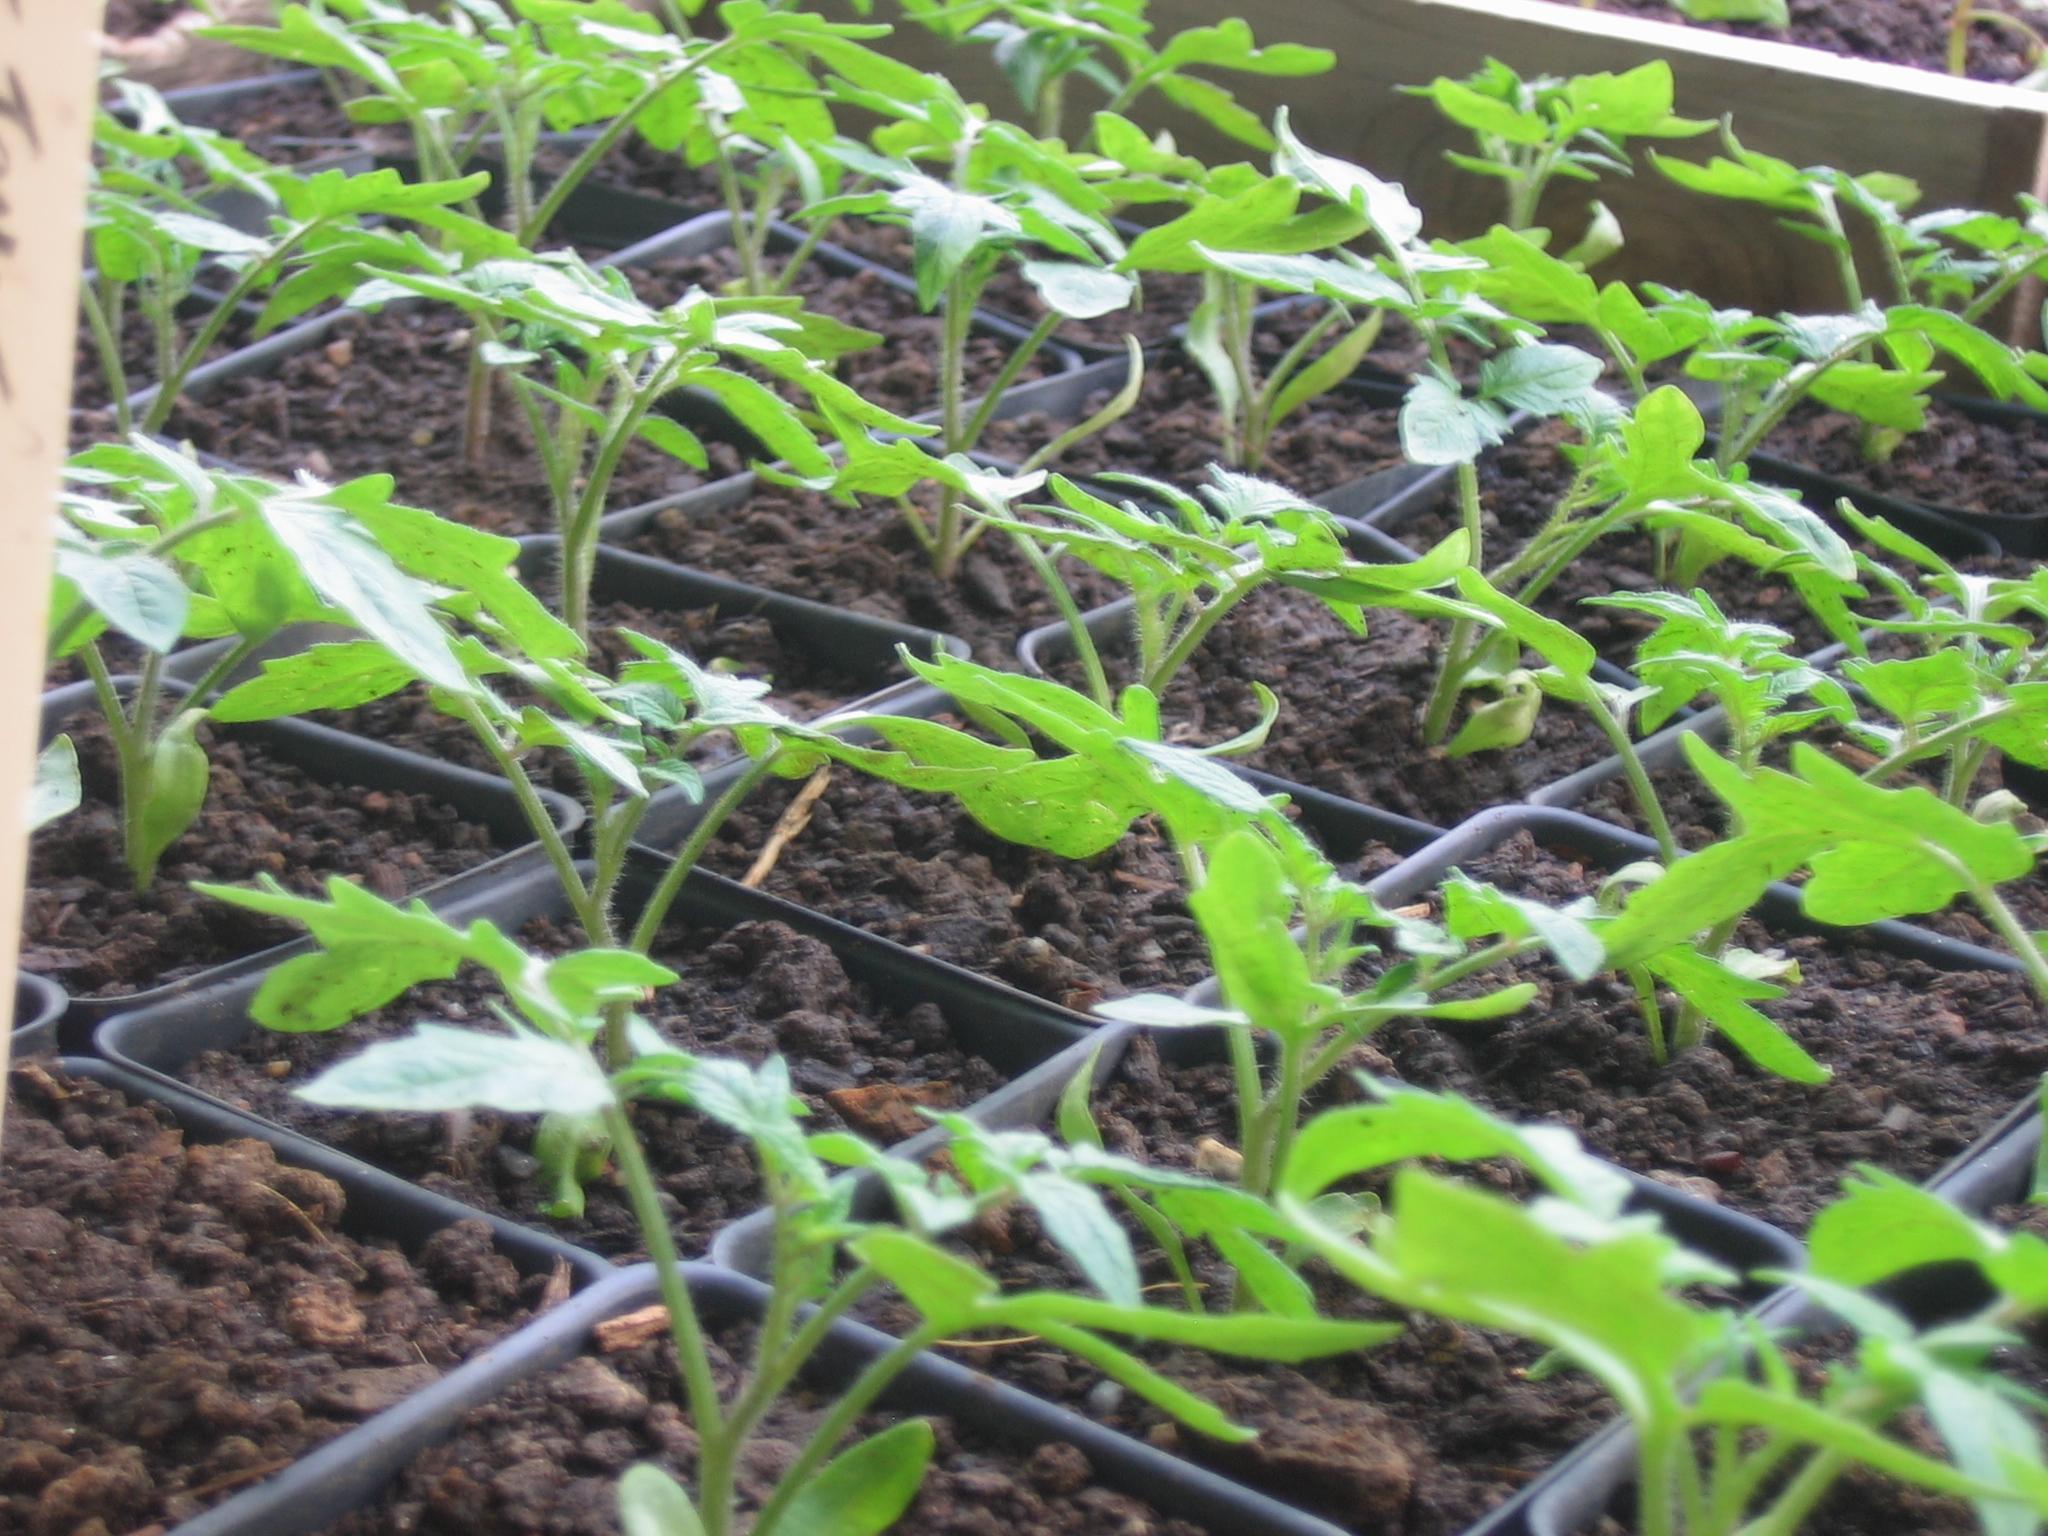 Biodegradable Plastic Mulch Sustainable Market Farming